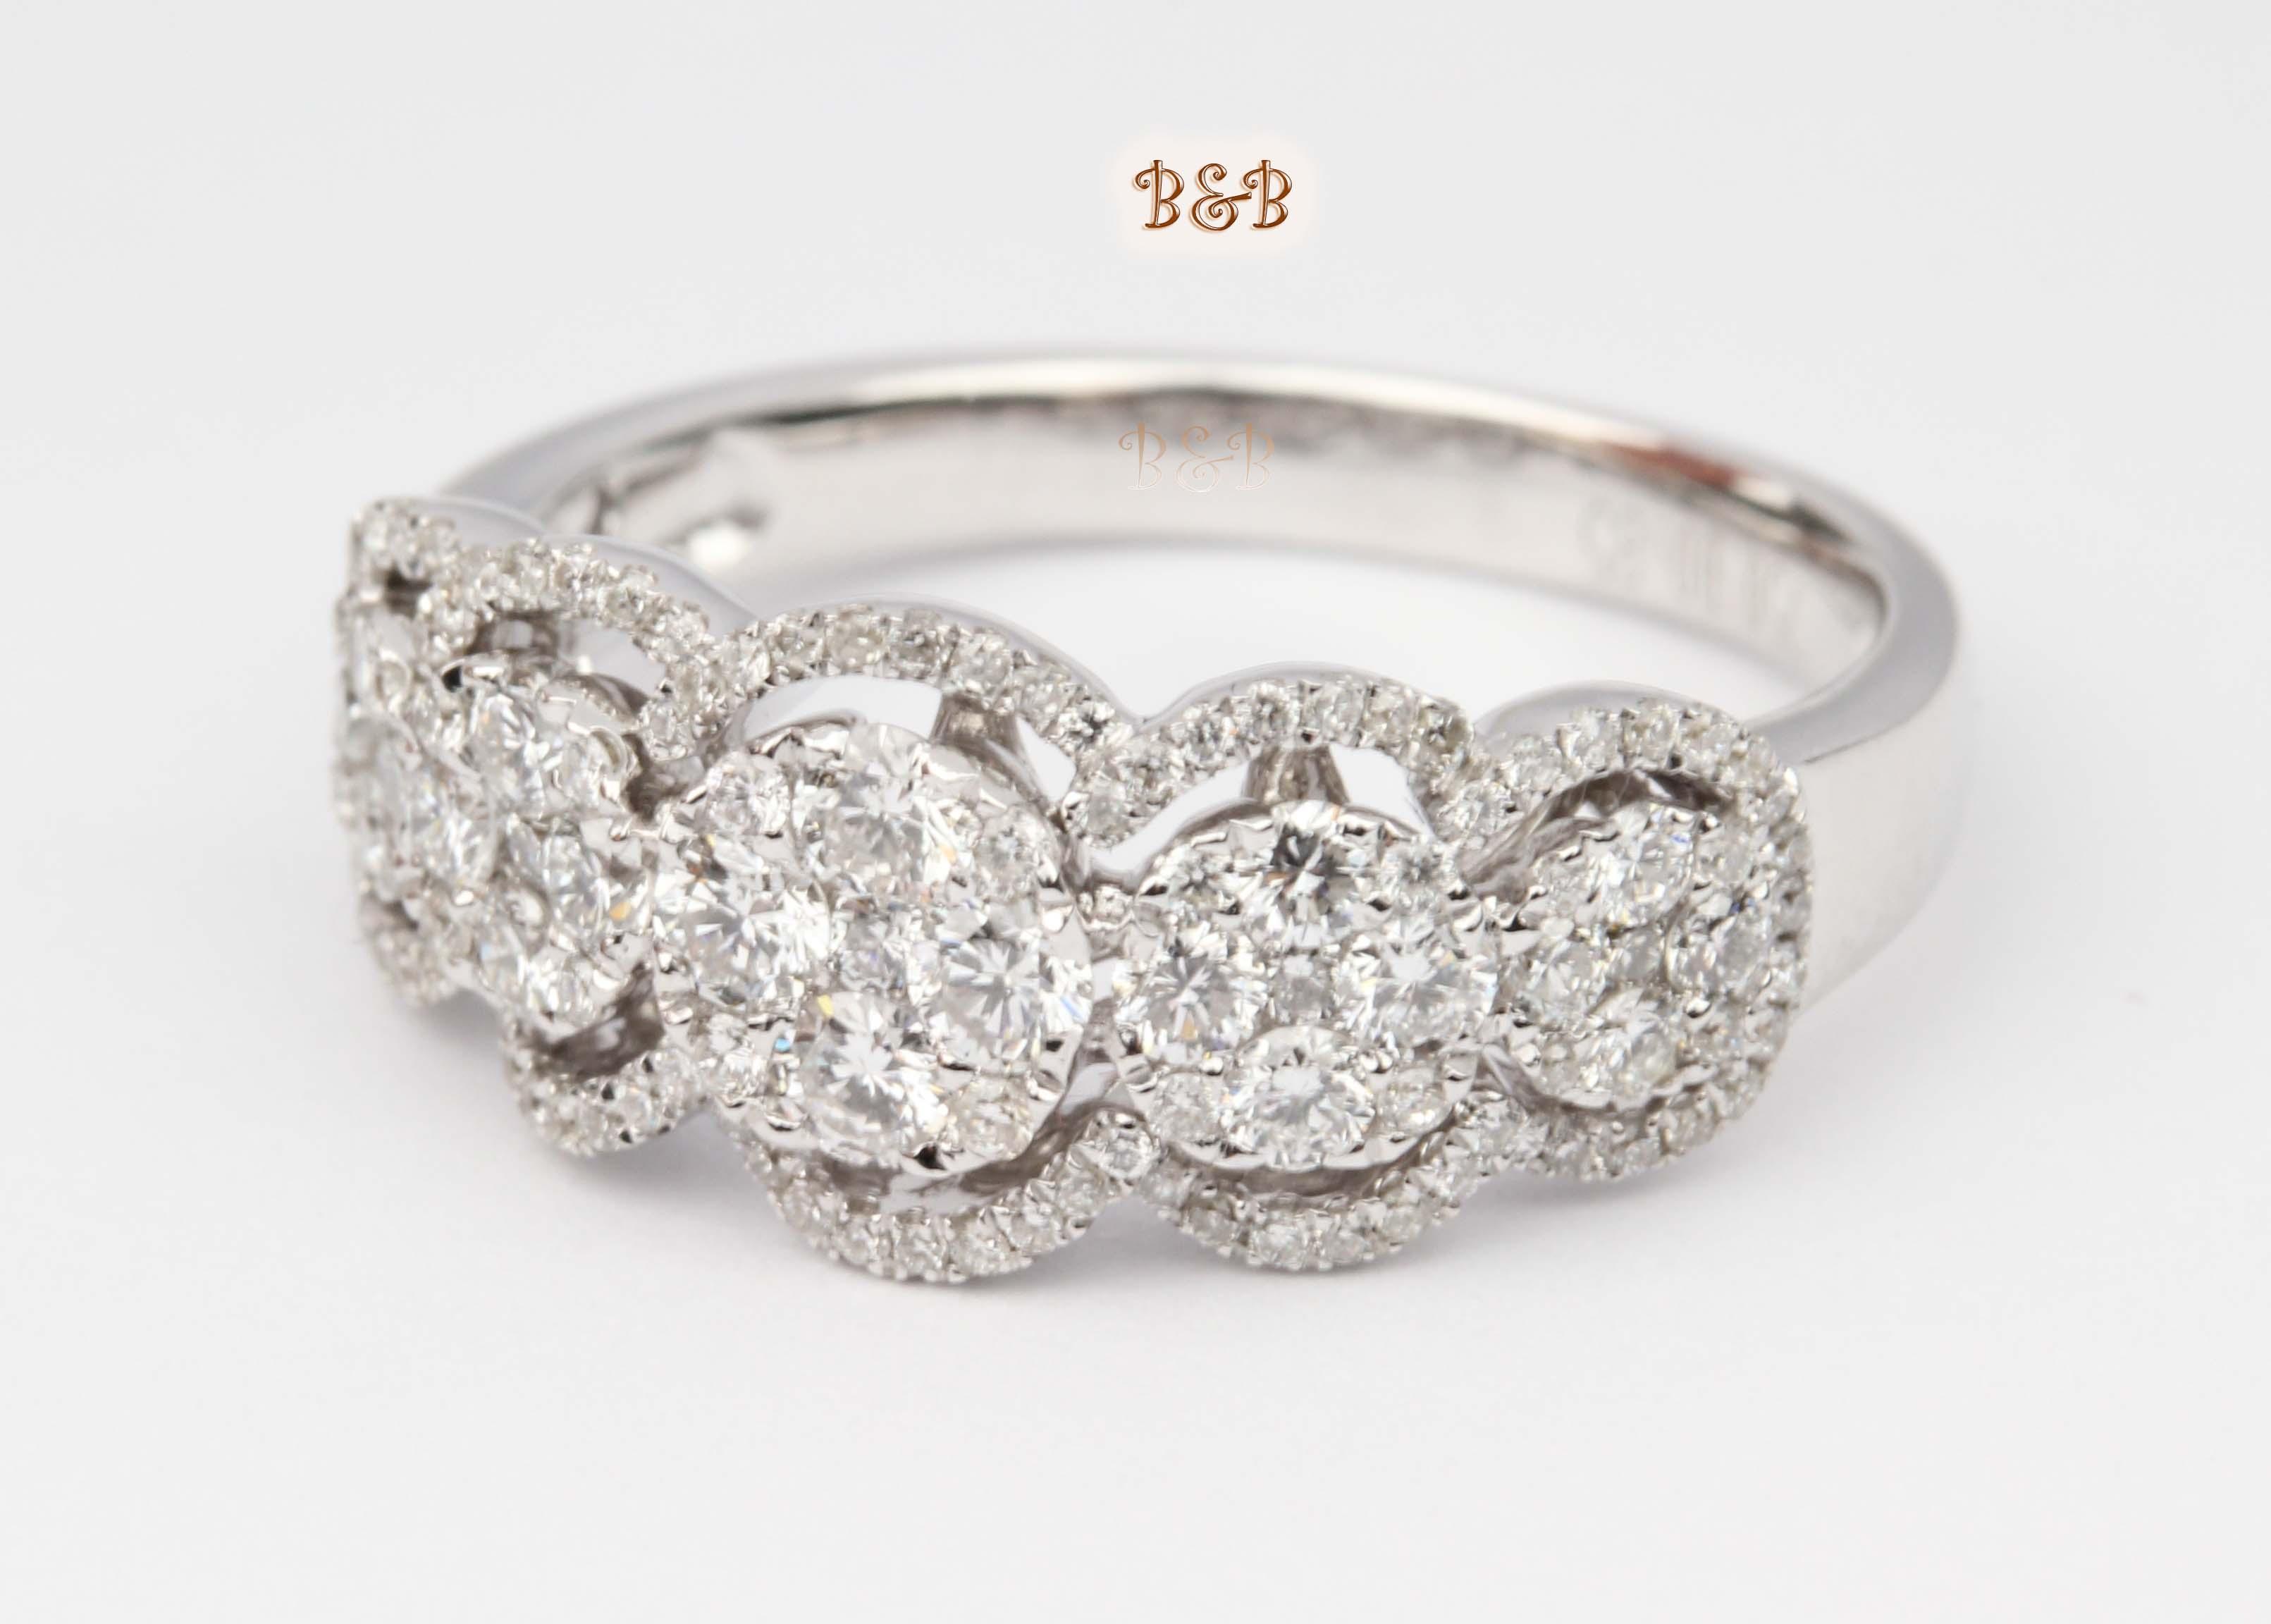 Silver ring_B&B_1886